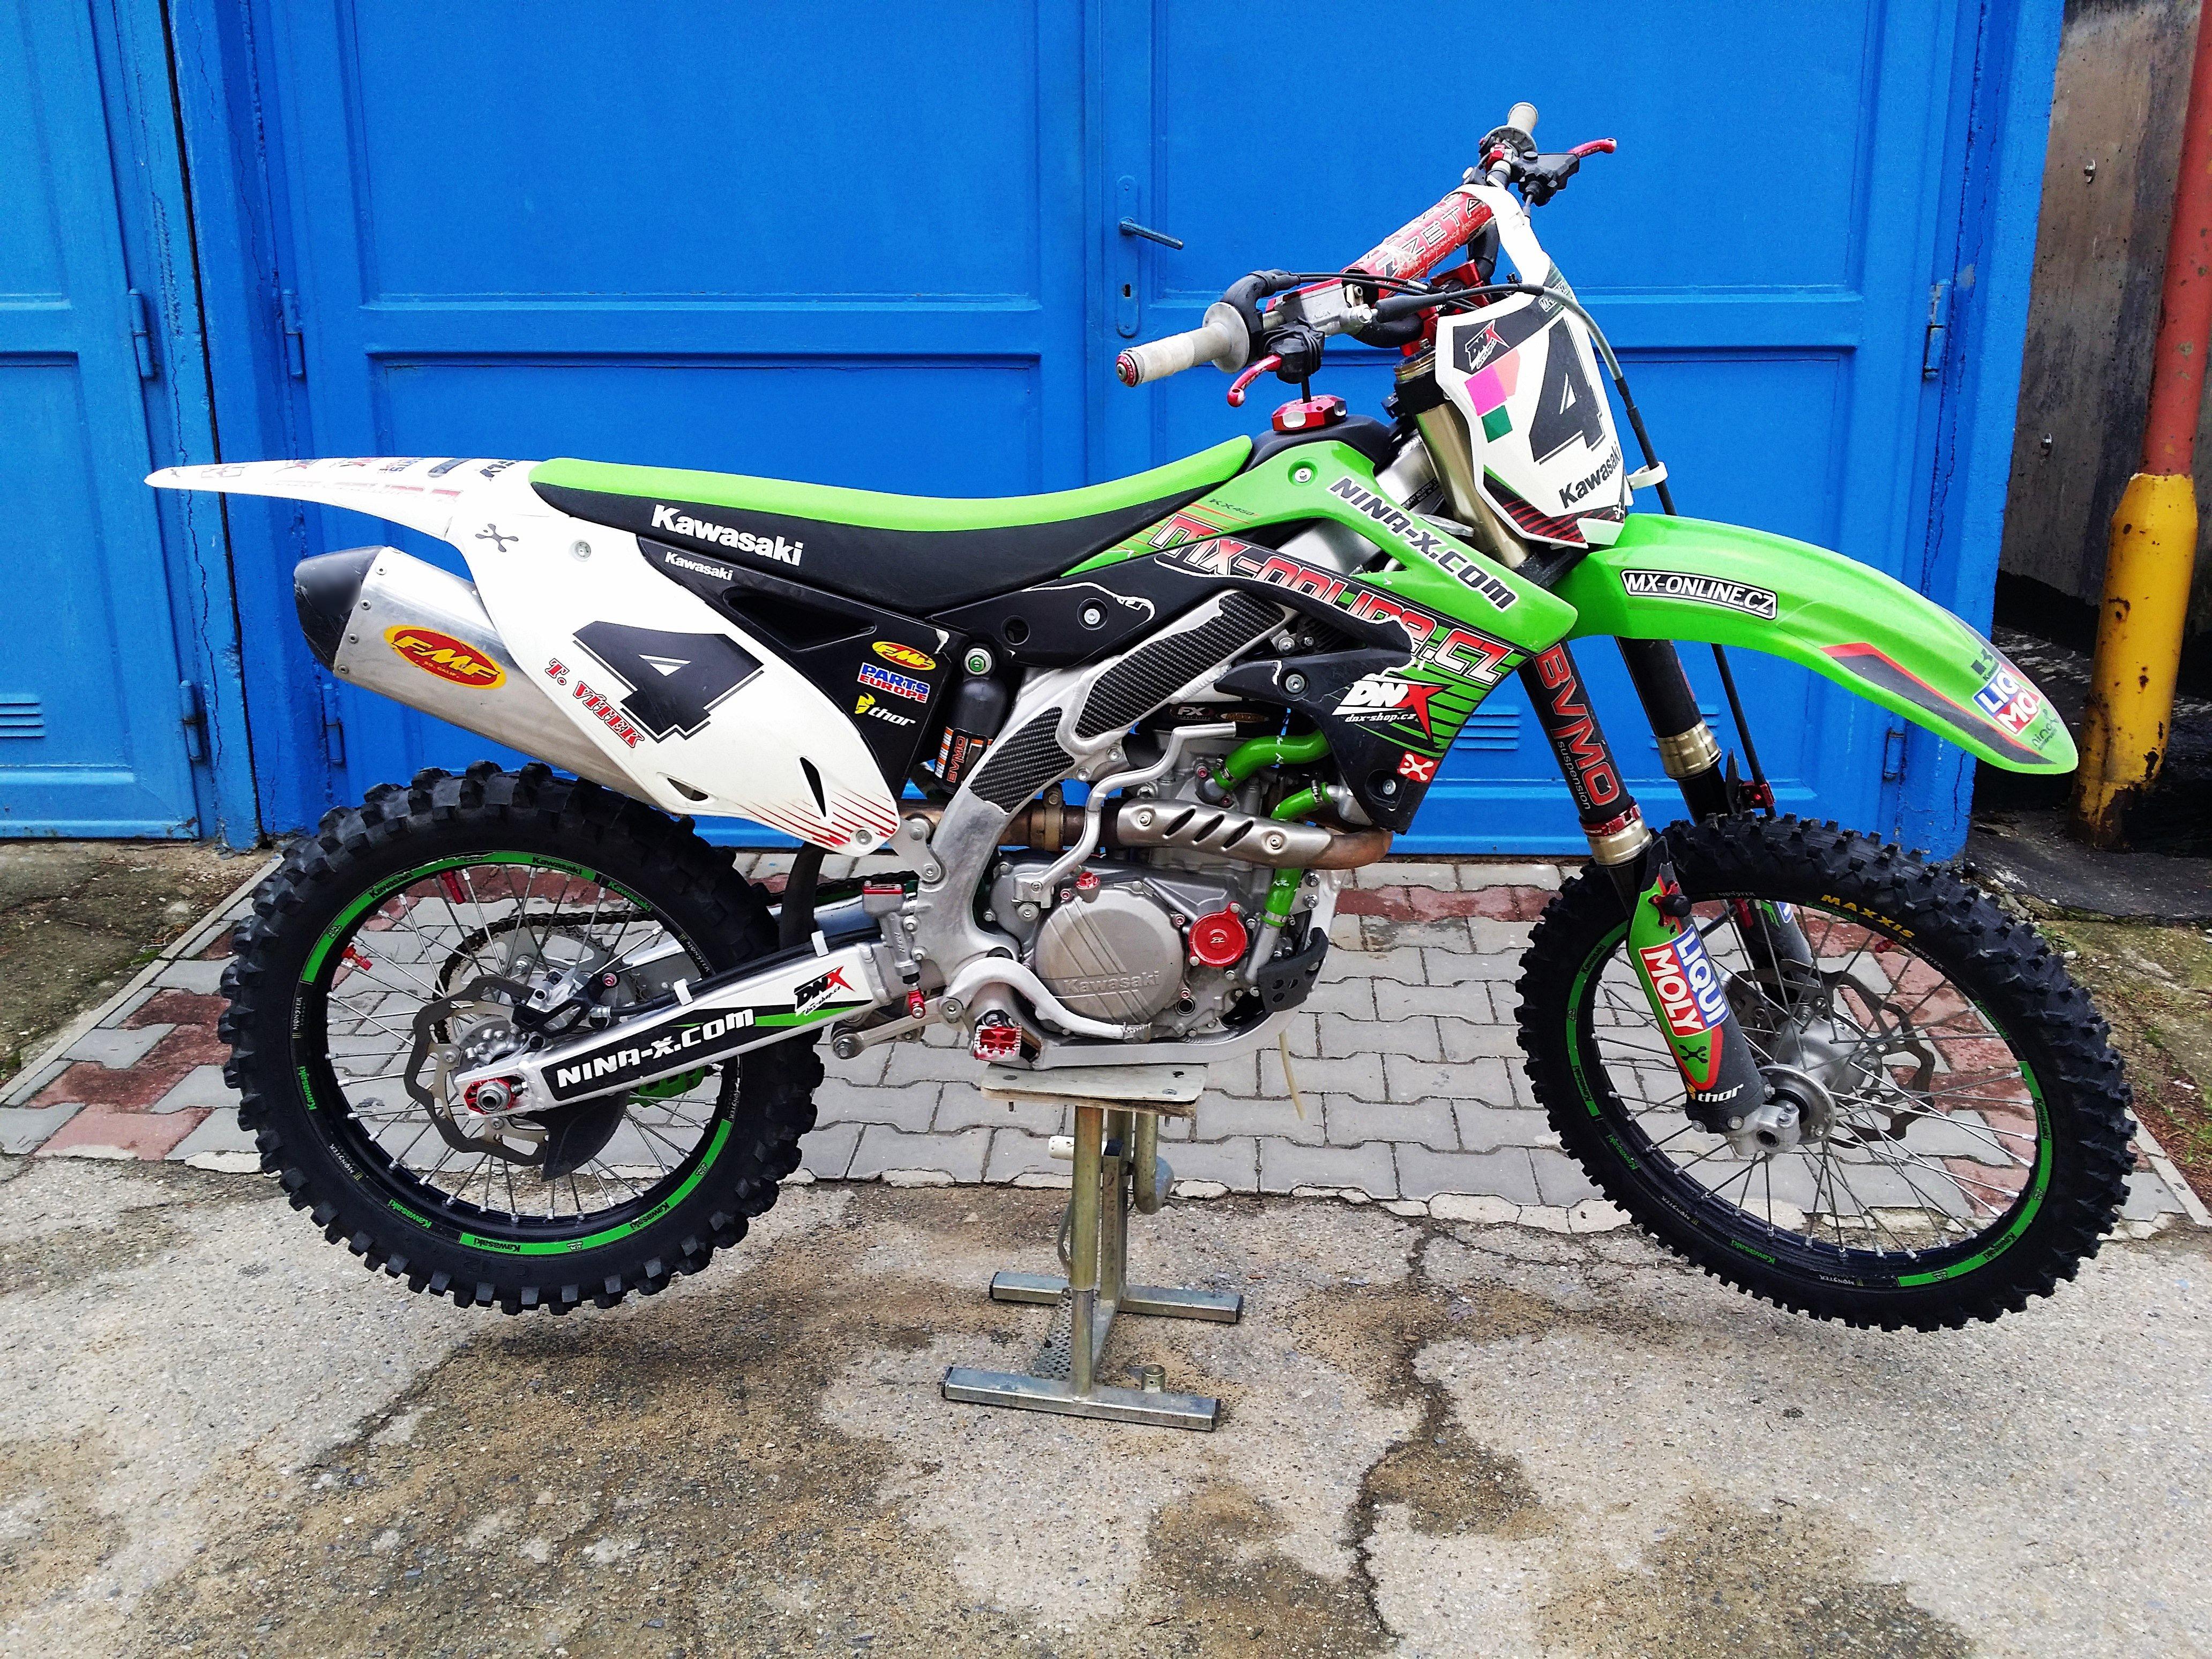 Kawasaki KX 450 F 450 cm³ 2016 - Vaasa - Motorcycle